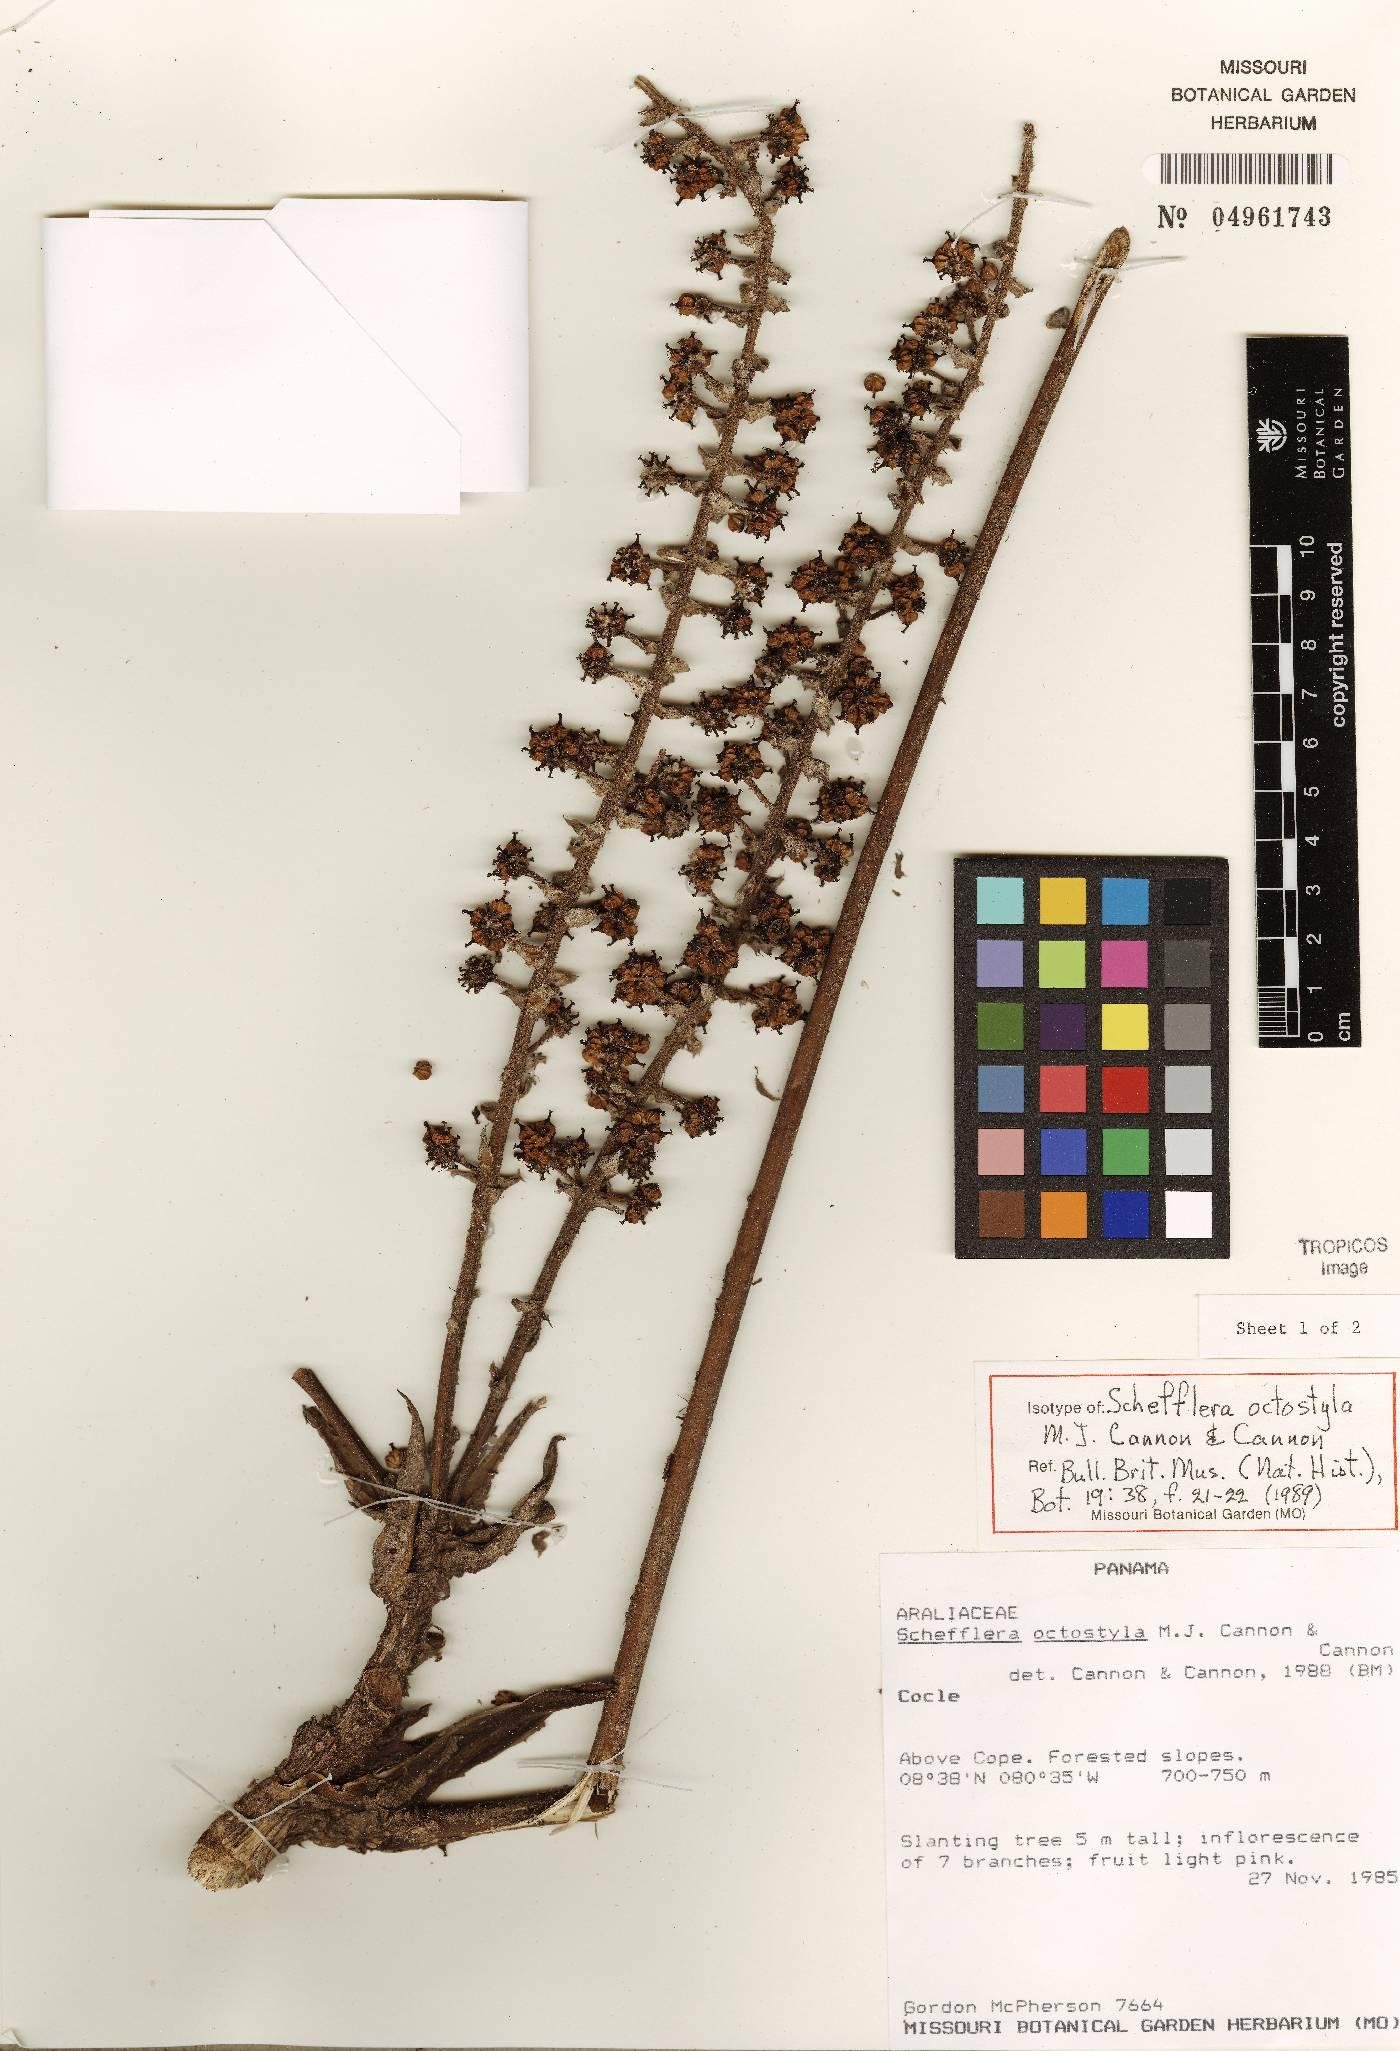 Schefflera octostyla image